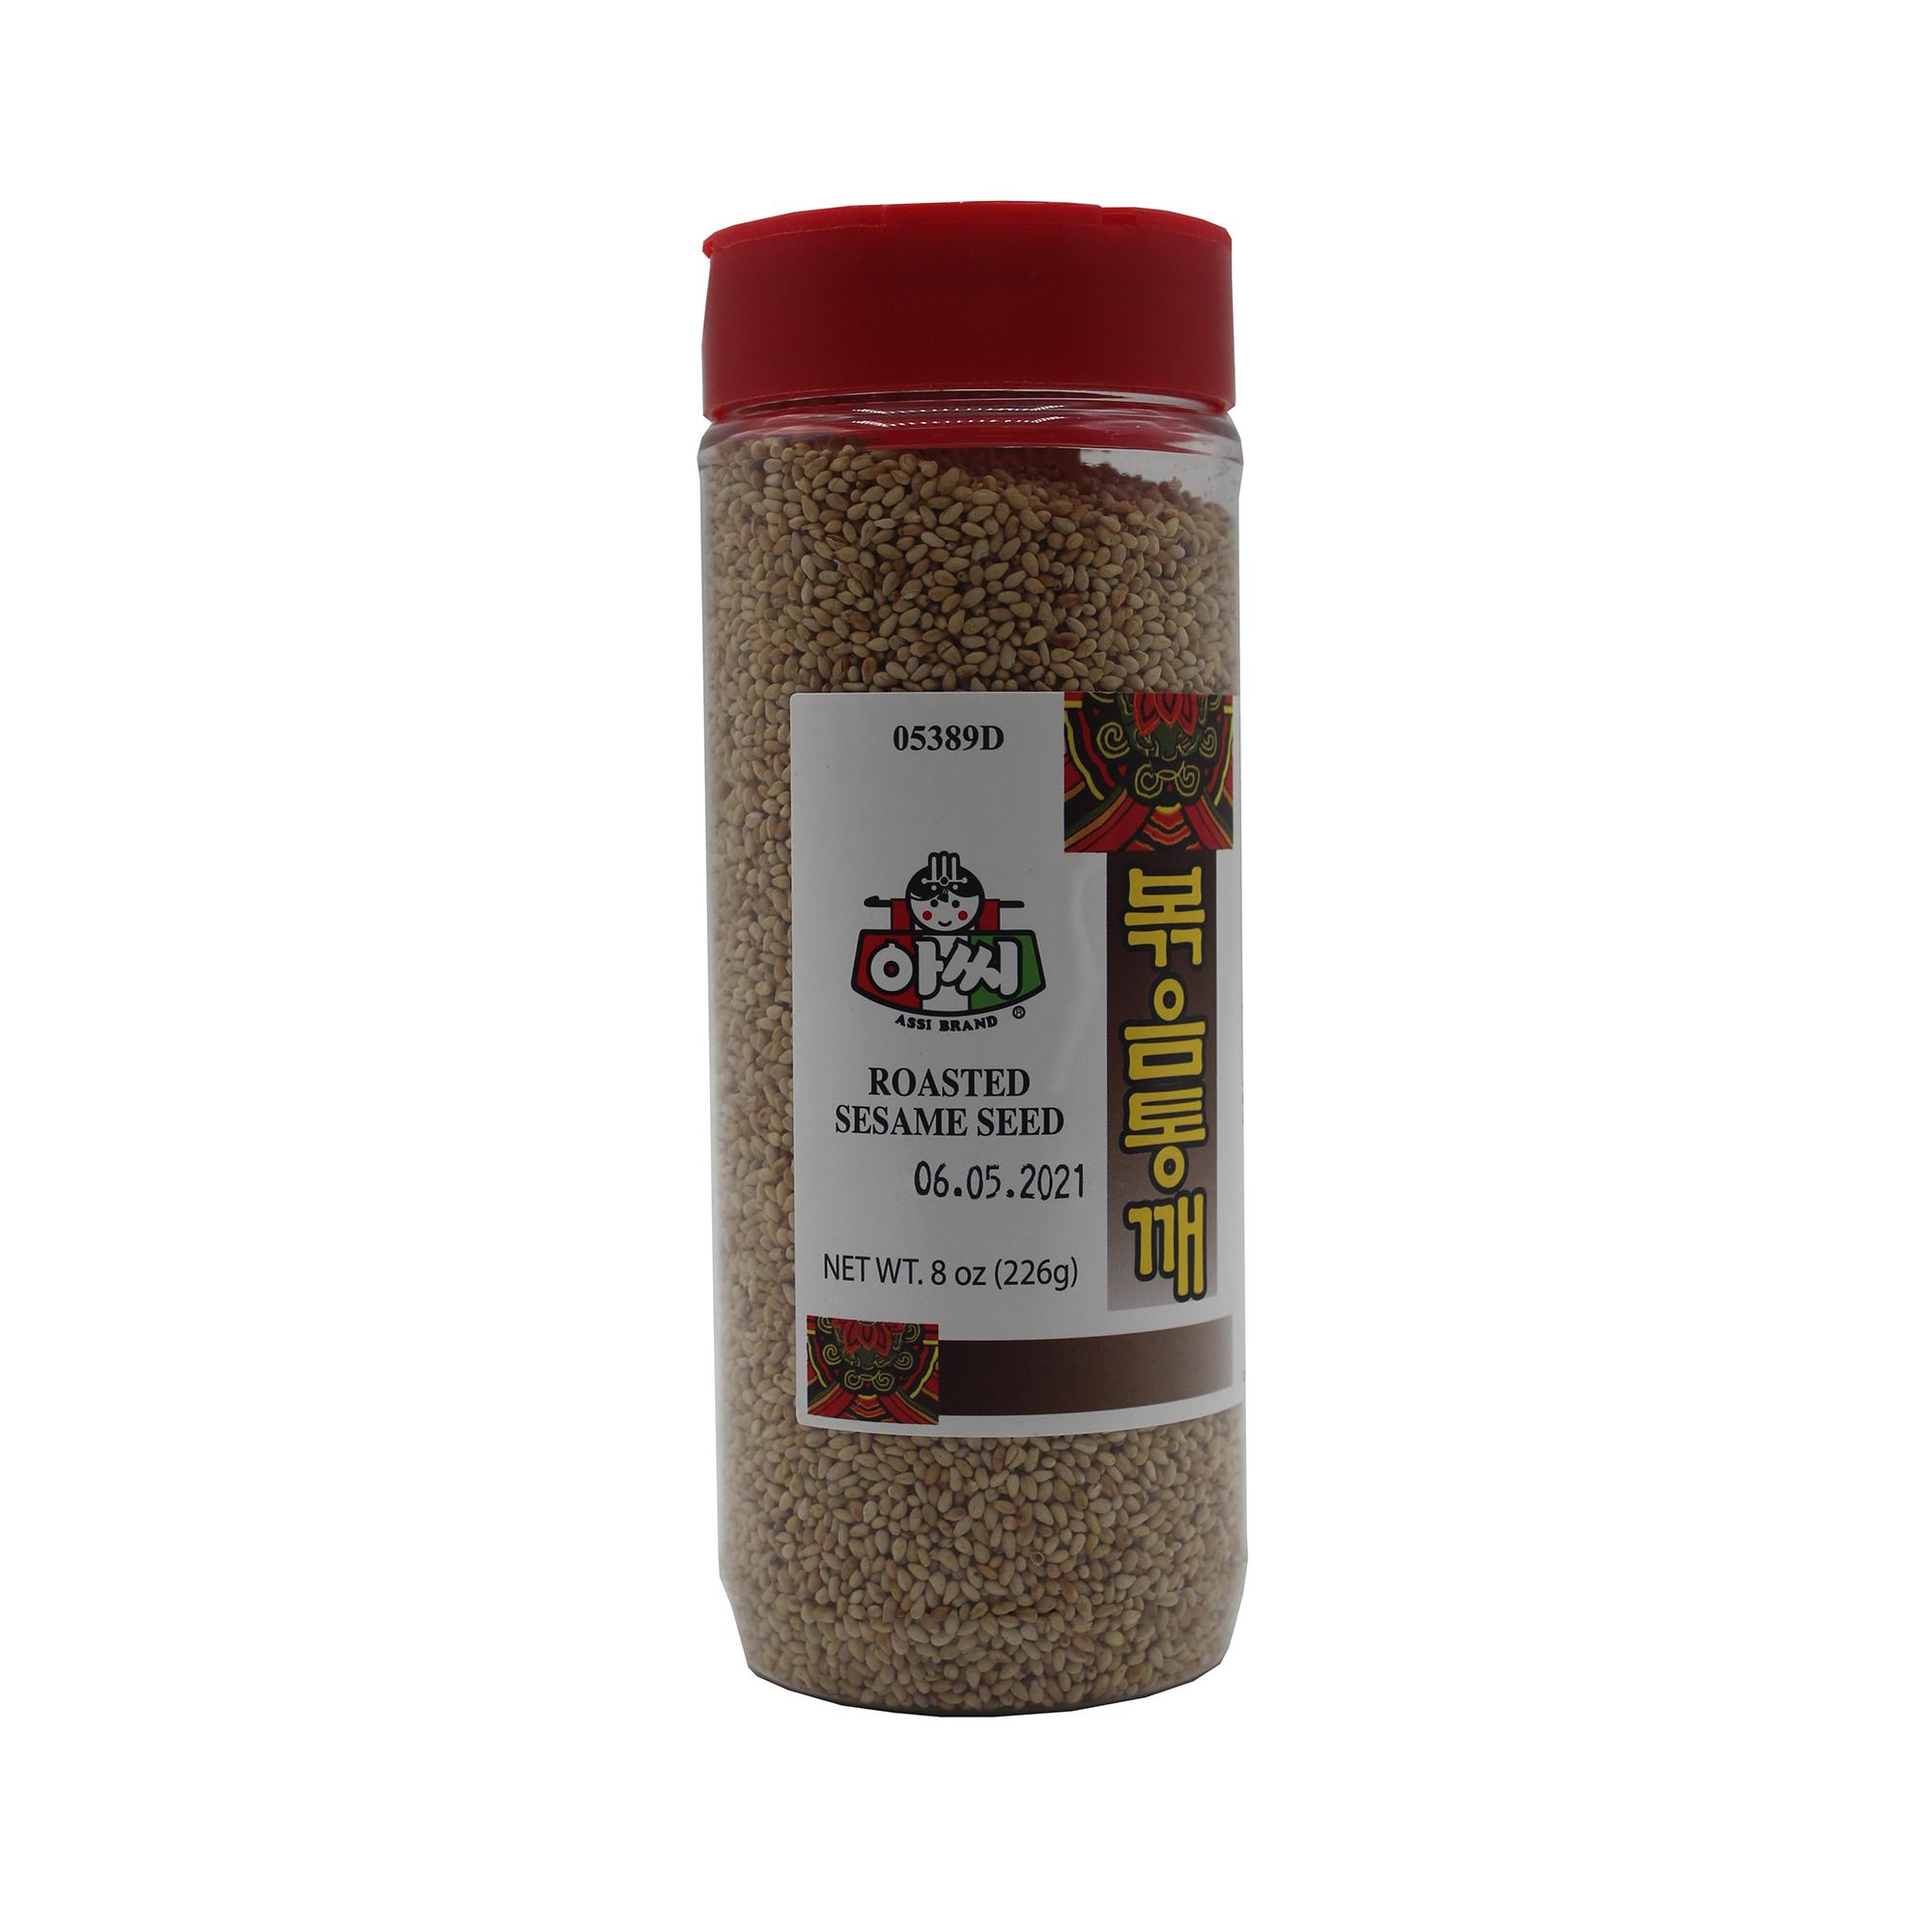 ASSI Roasted Sesame Seed 8 Oz